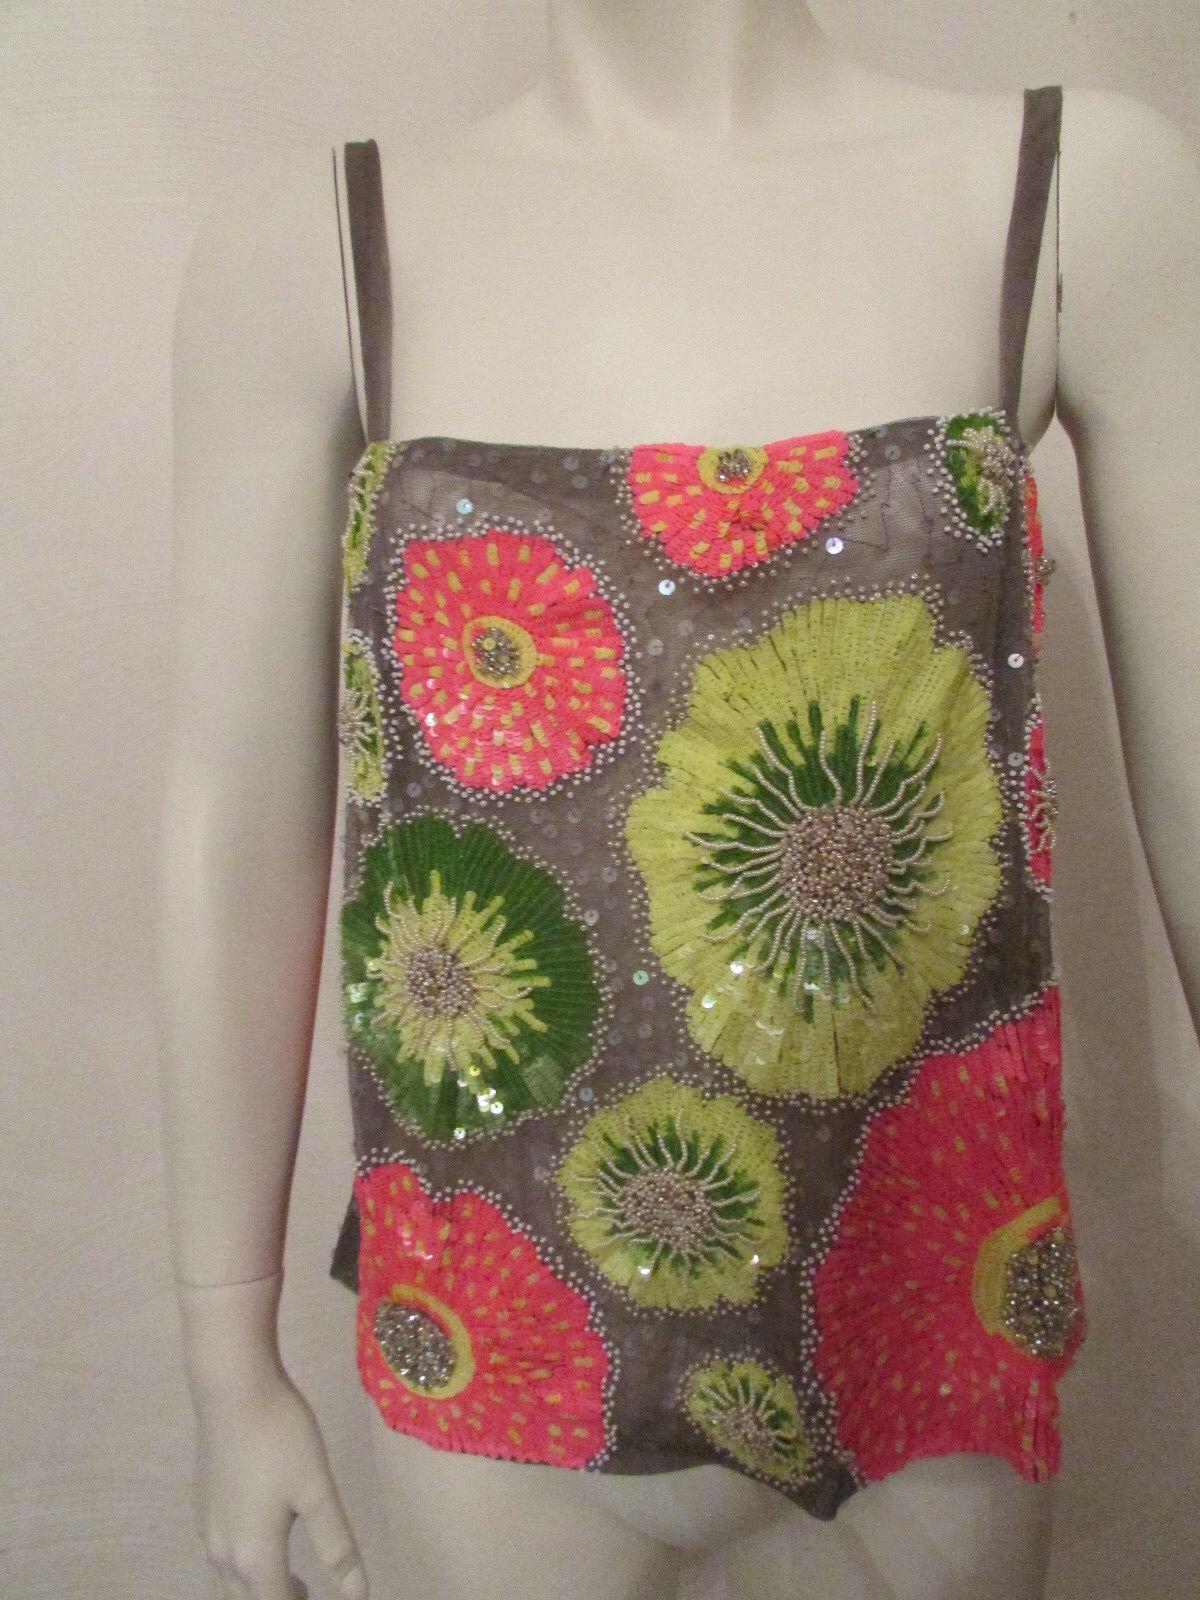 BNWT 3450 Work of Art Tuleh tank top blouse camisole multi coloROT beaded sz 6